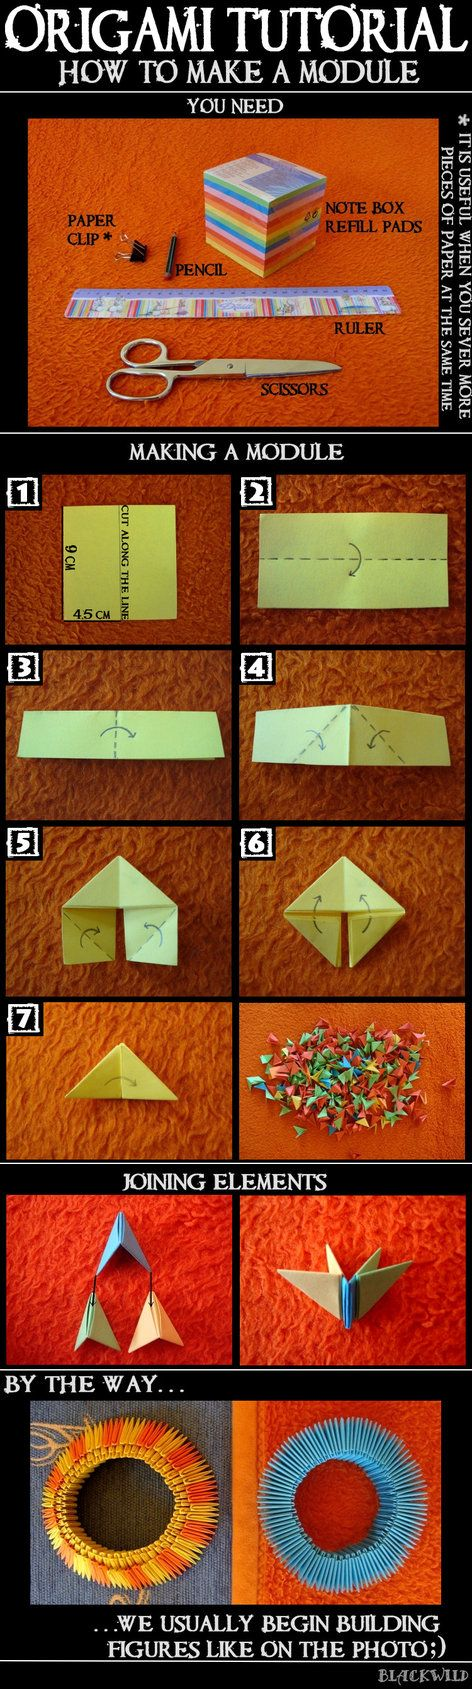 Origami Tutorial - Módulo por ~ blackwild on deviantART